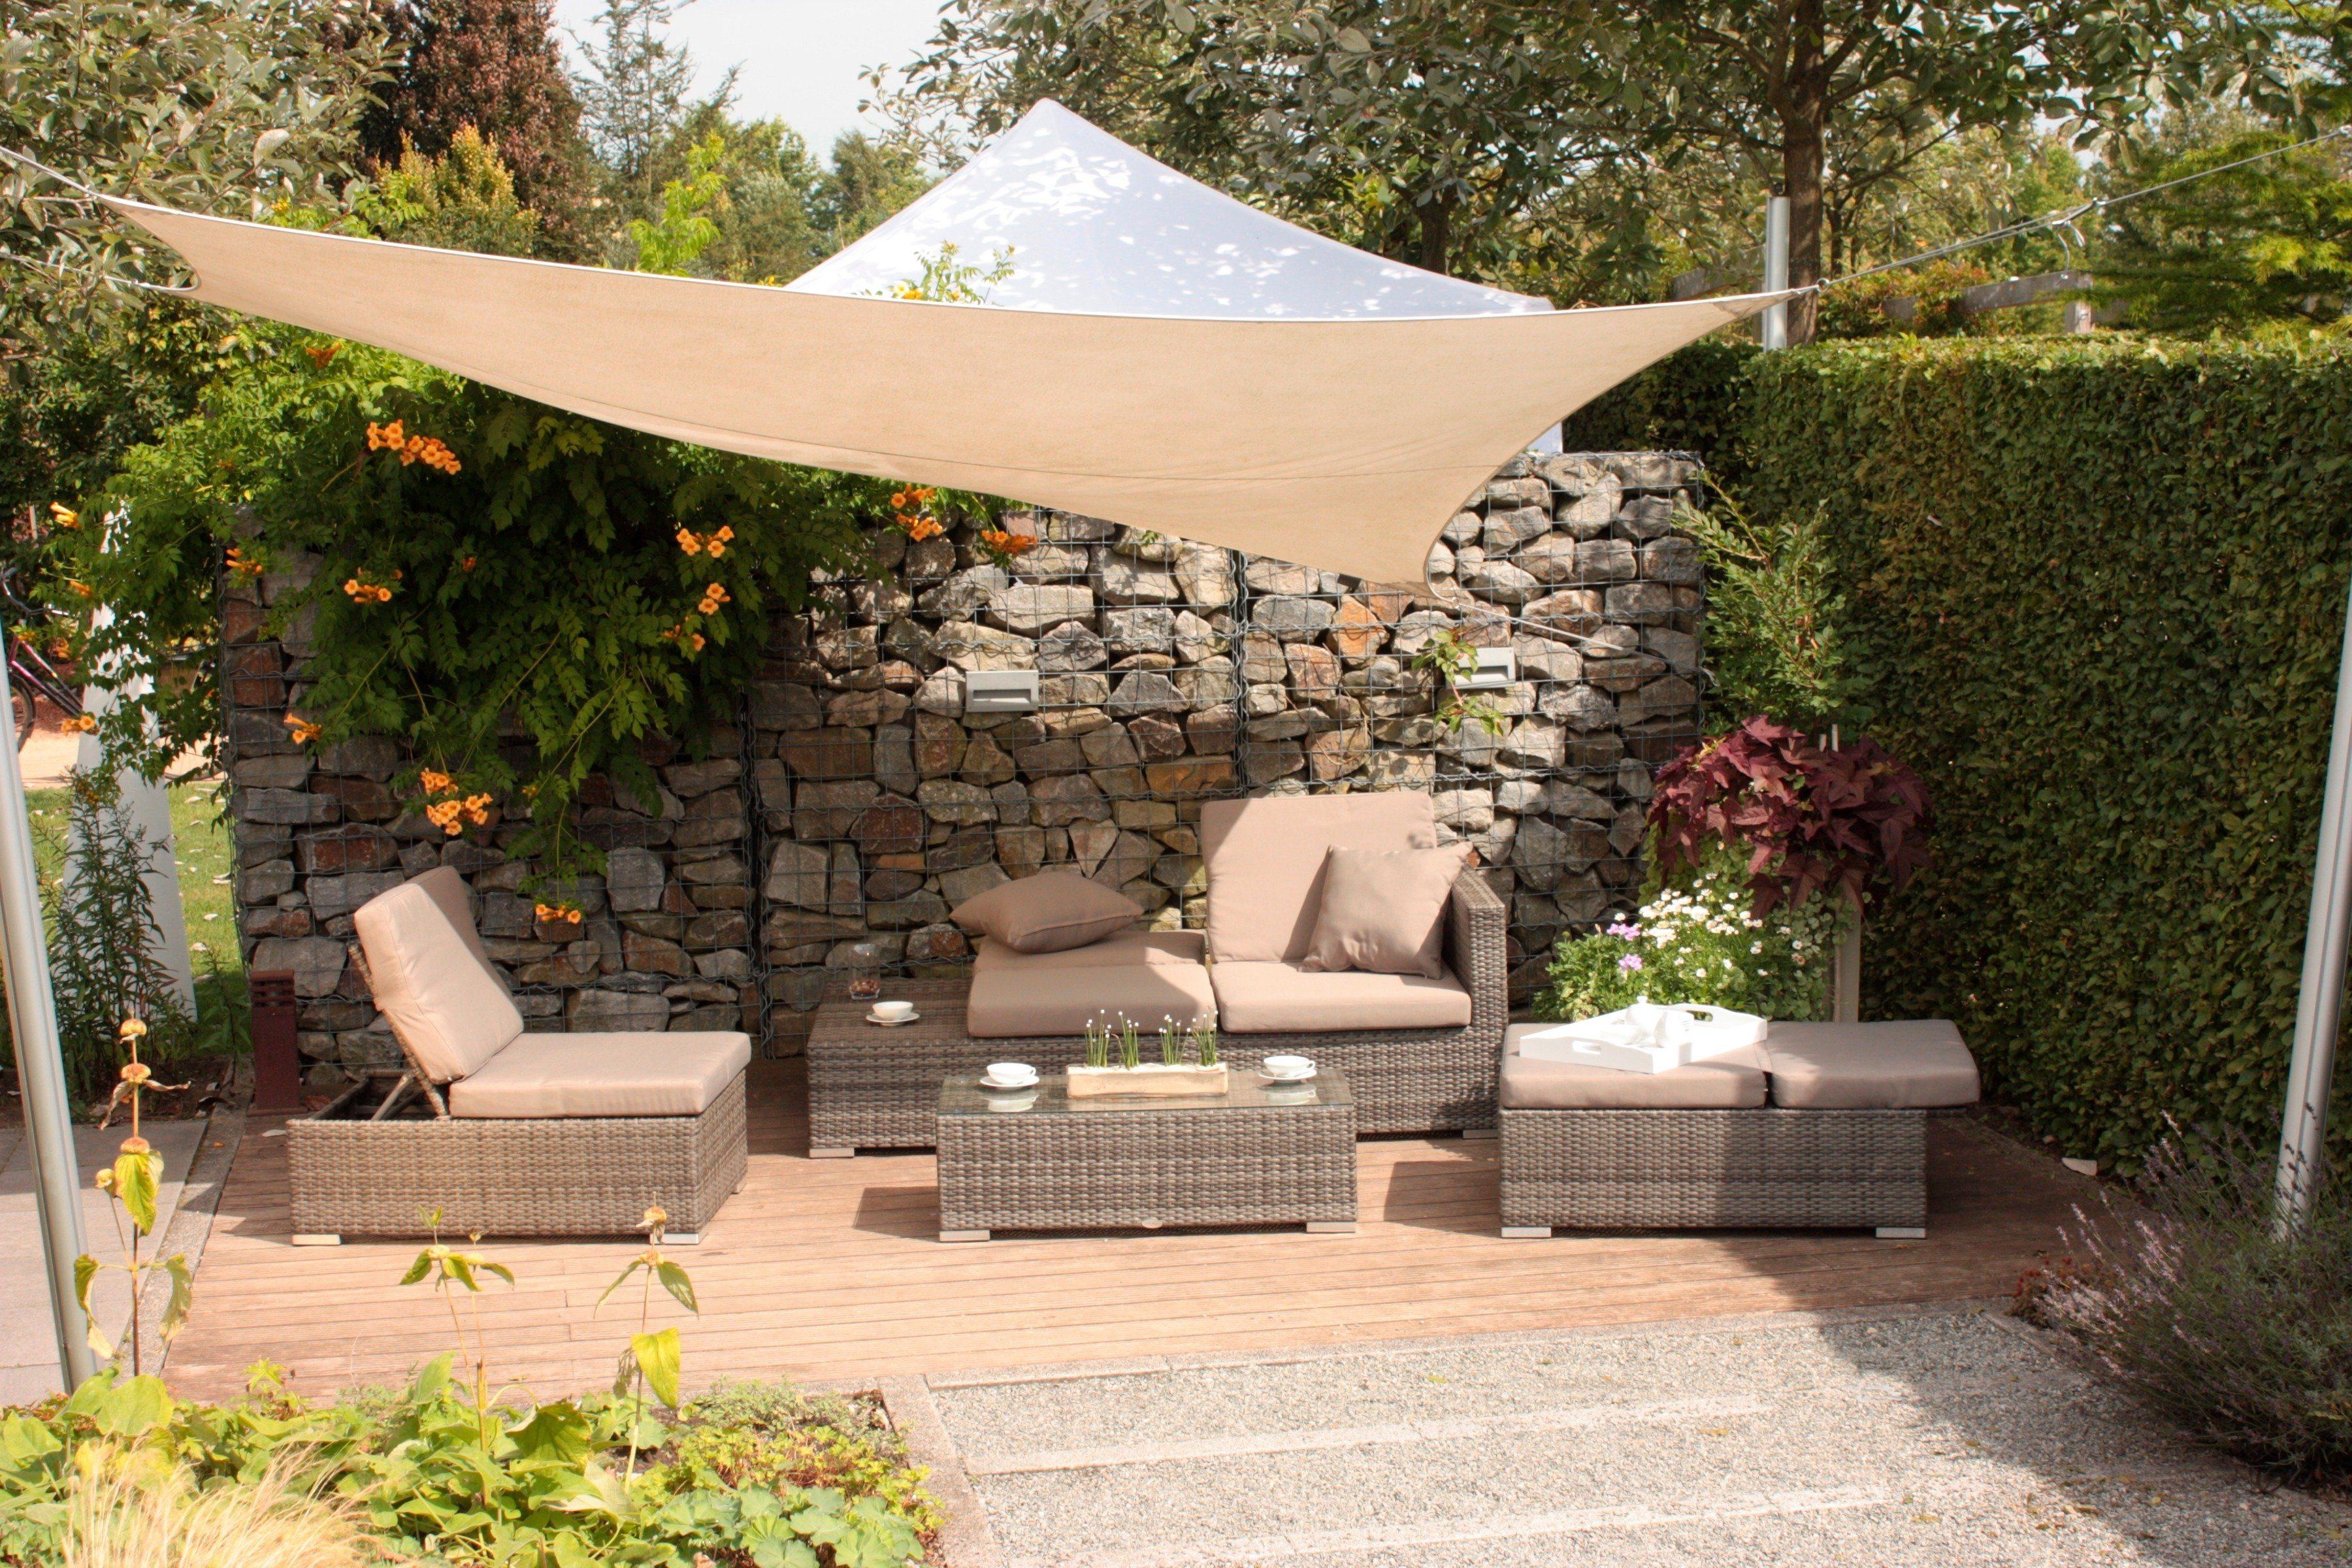 10-tgl. Loungeset »Alcudia«, 2er-Sofa, 2 Sessel, Tisch 101x44,5 cm, Polyrattan, grau, verstellbar